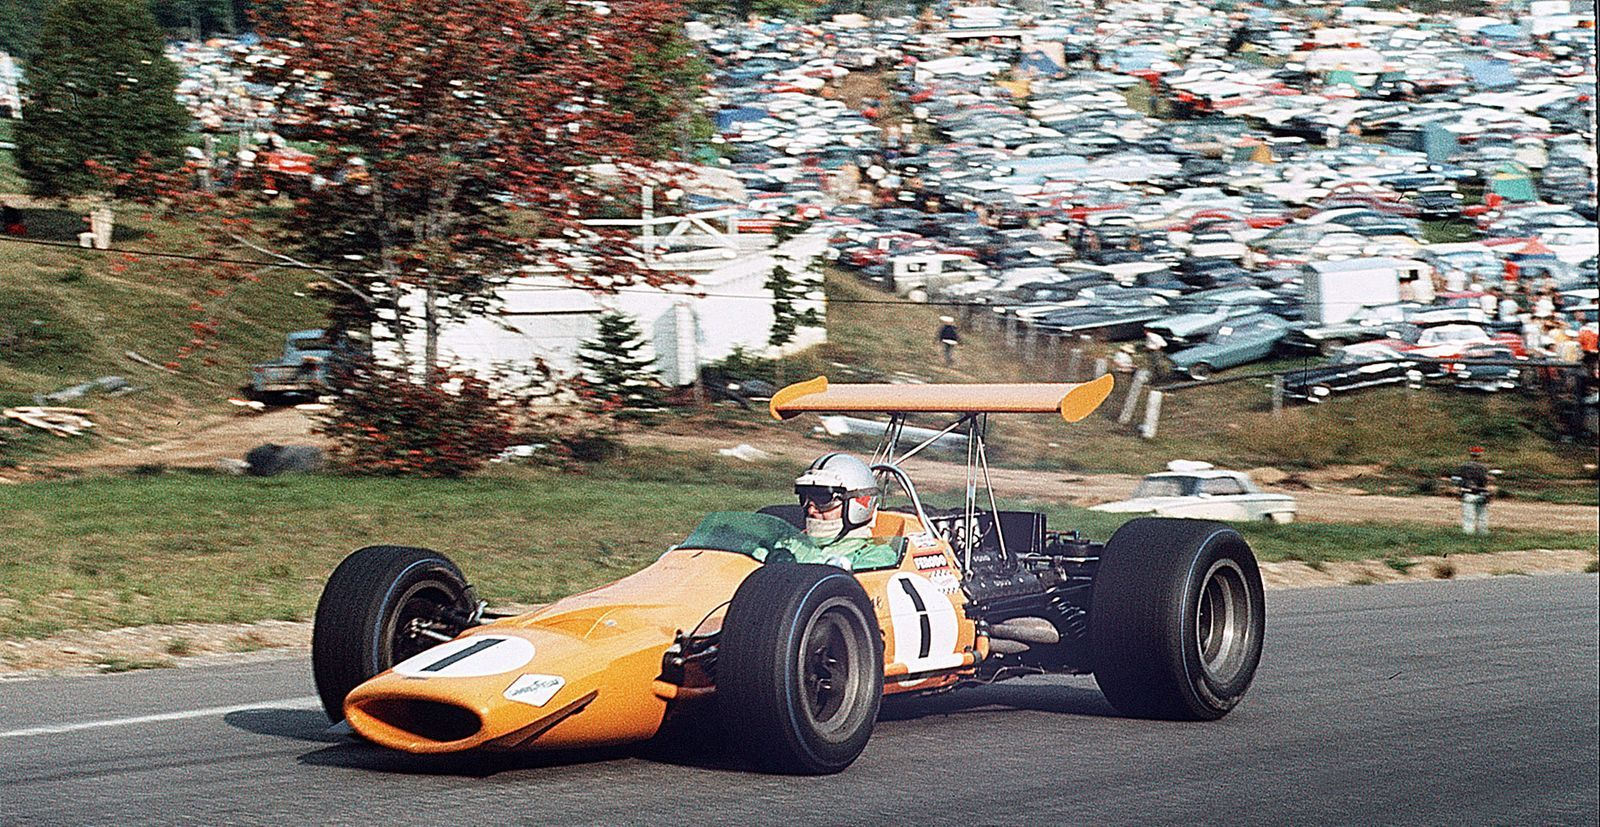 Denny Hulme - Mclaren M7a 1968 Canadian Gp Mont-tremblant 1600x827 F1